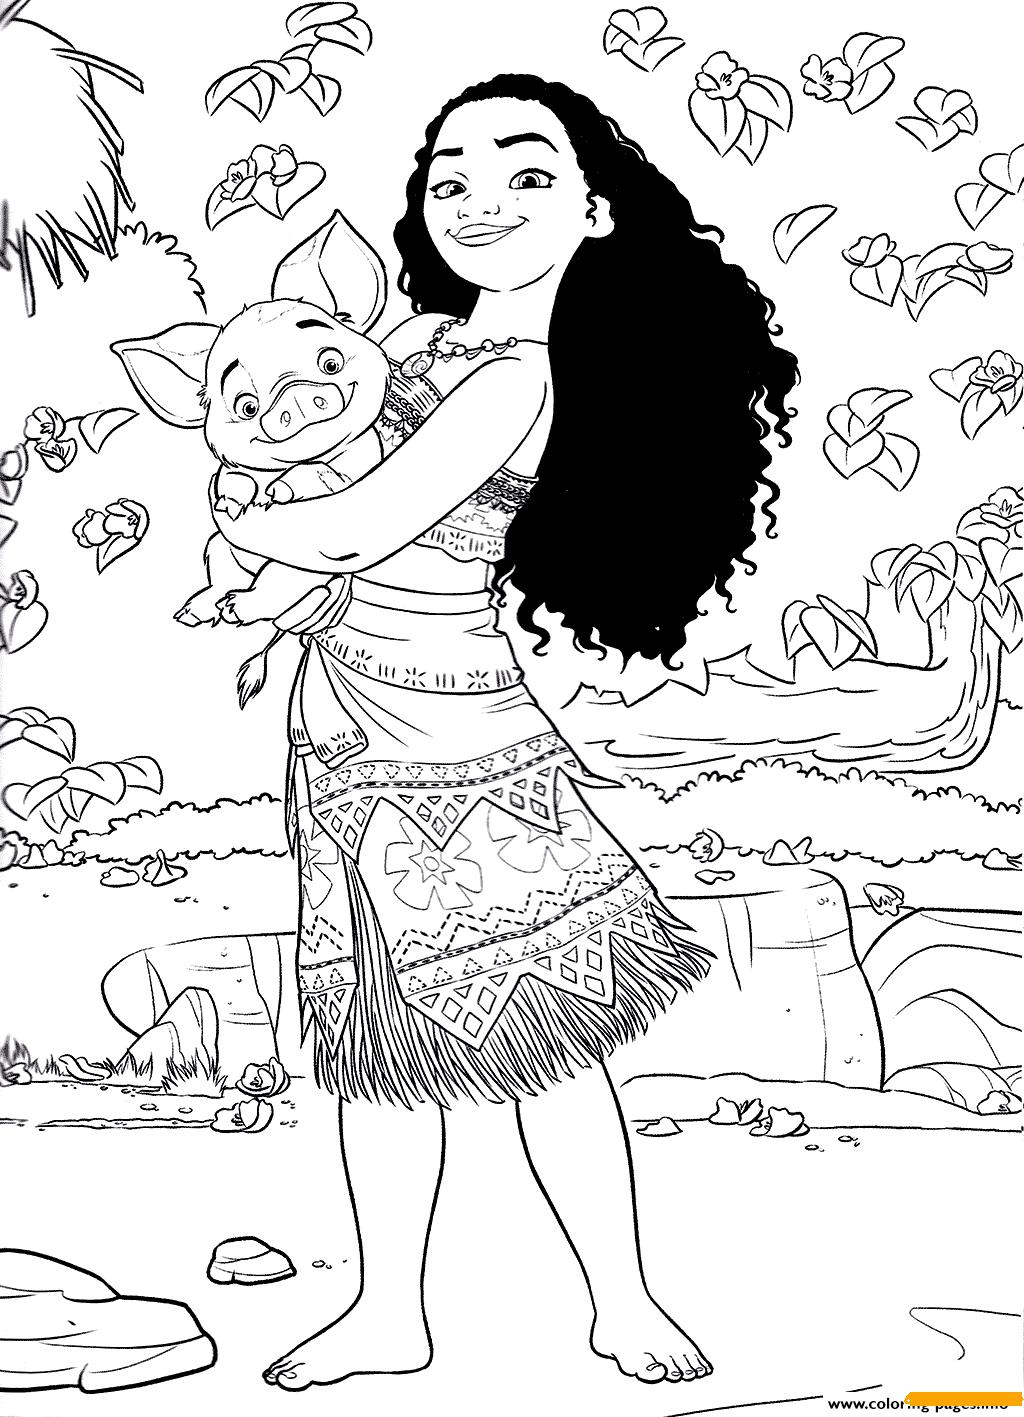 Pua And Princess Moana Disney Coloring Pages